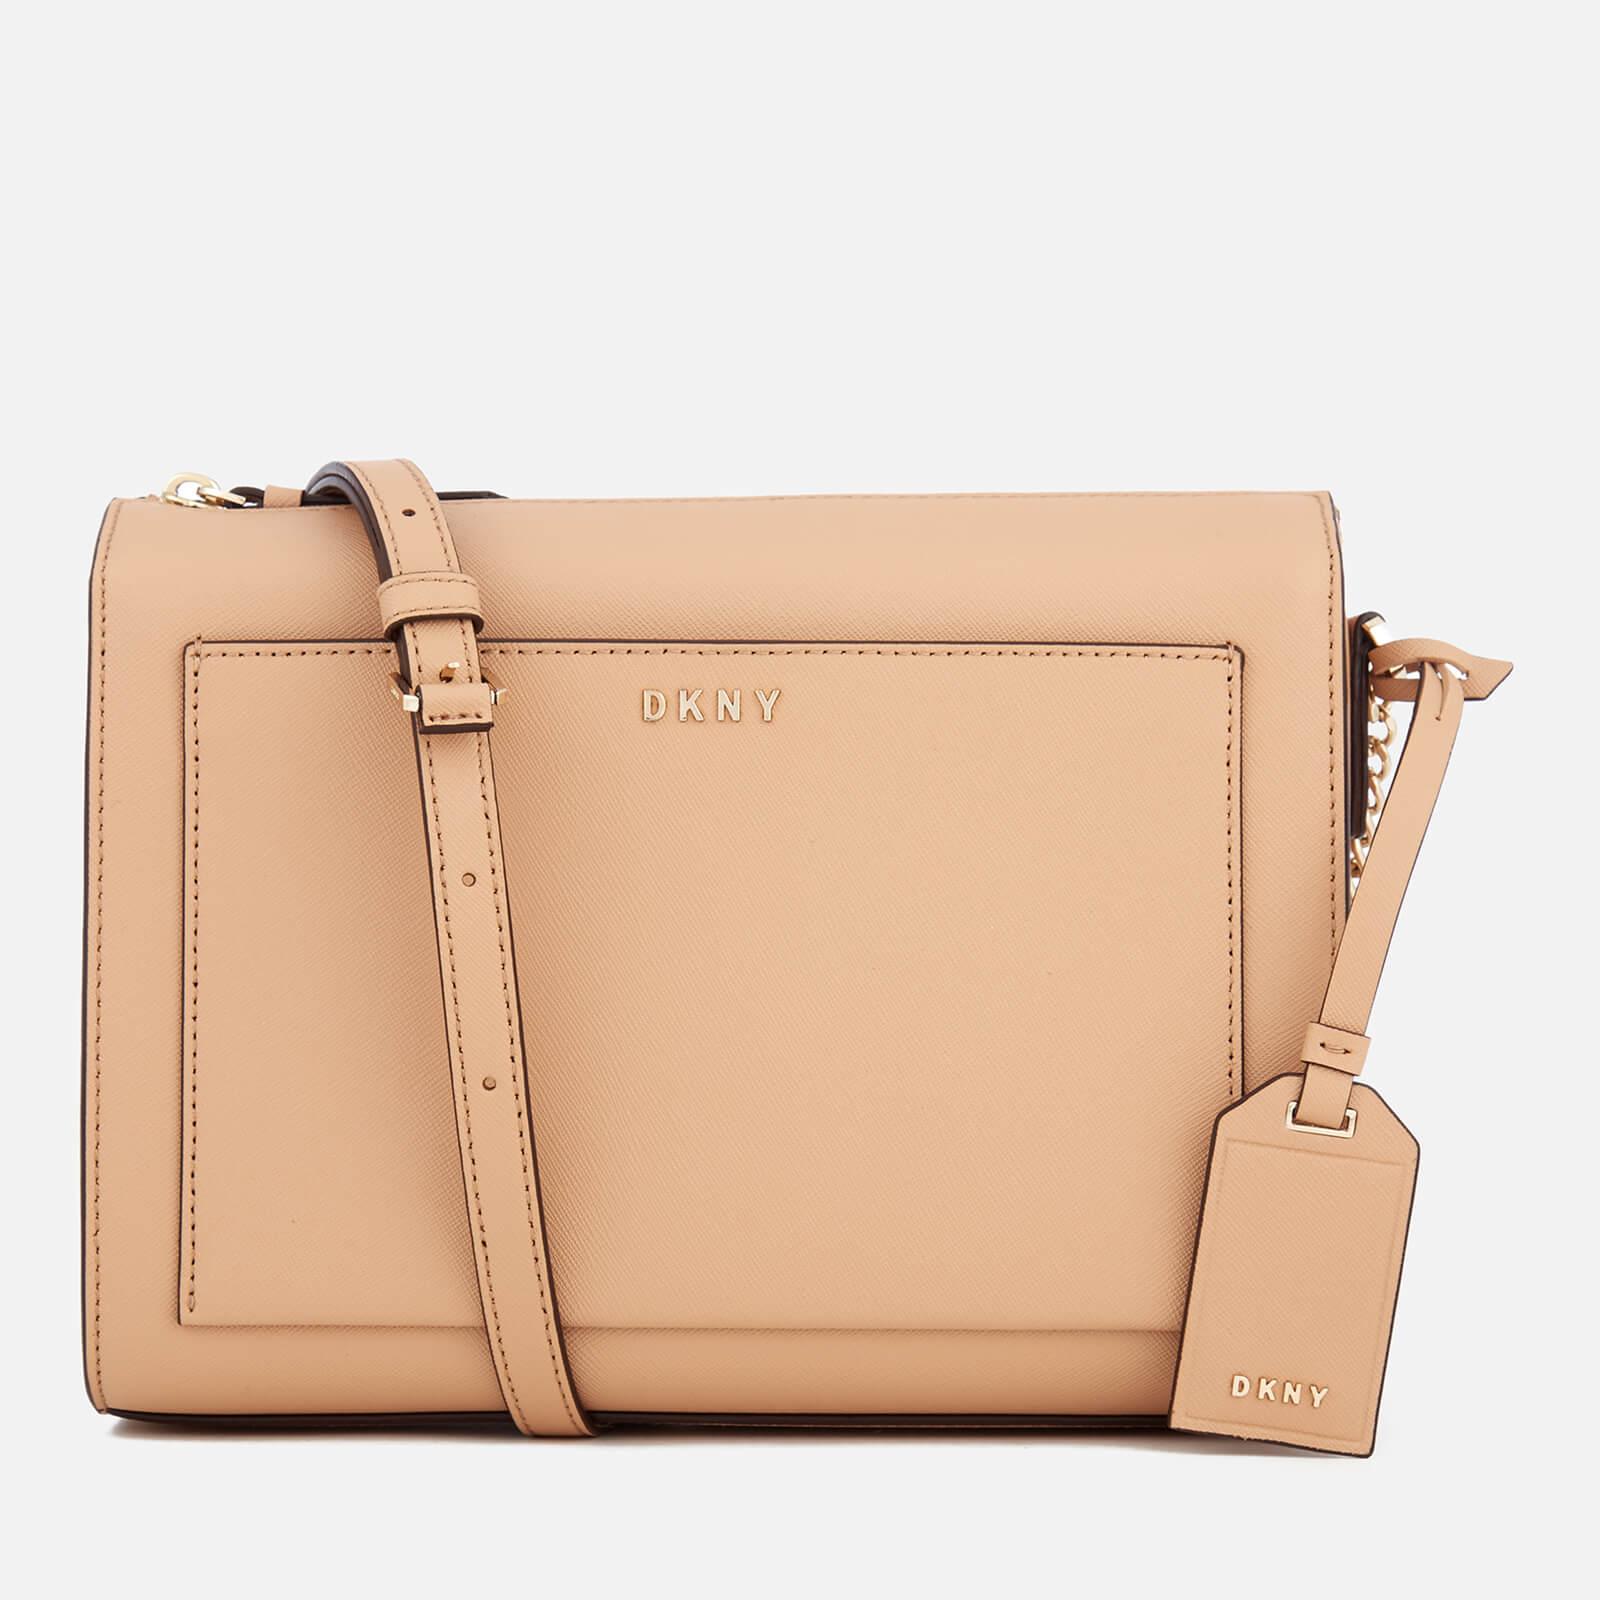 41245bc71655 DKNY Women s Bryant Park Medium Box Cross Body Bag - Tea - Free UK ...